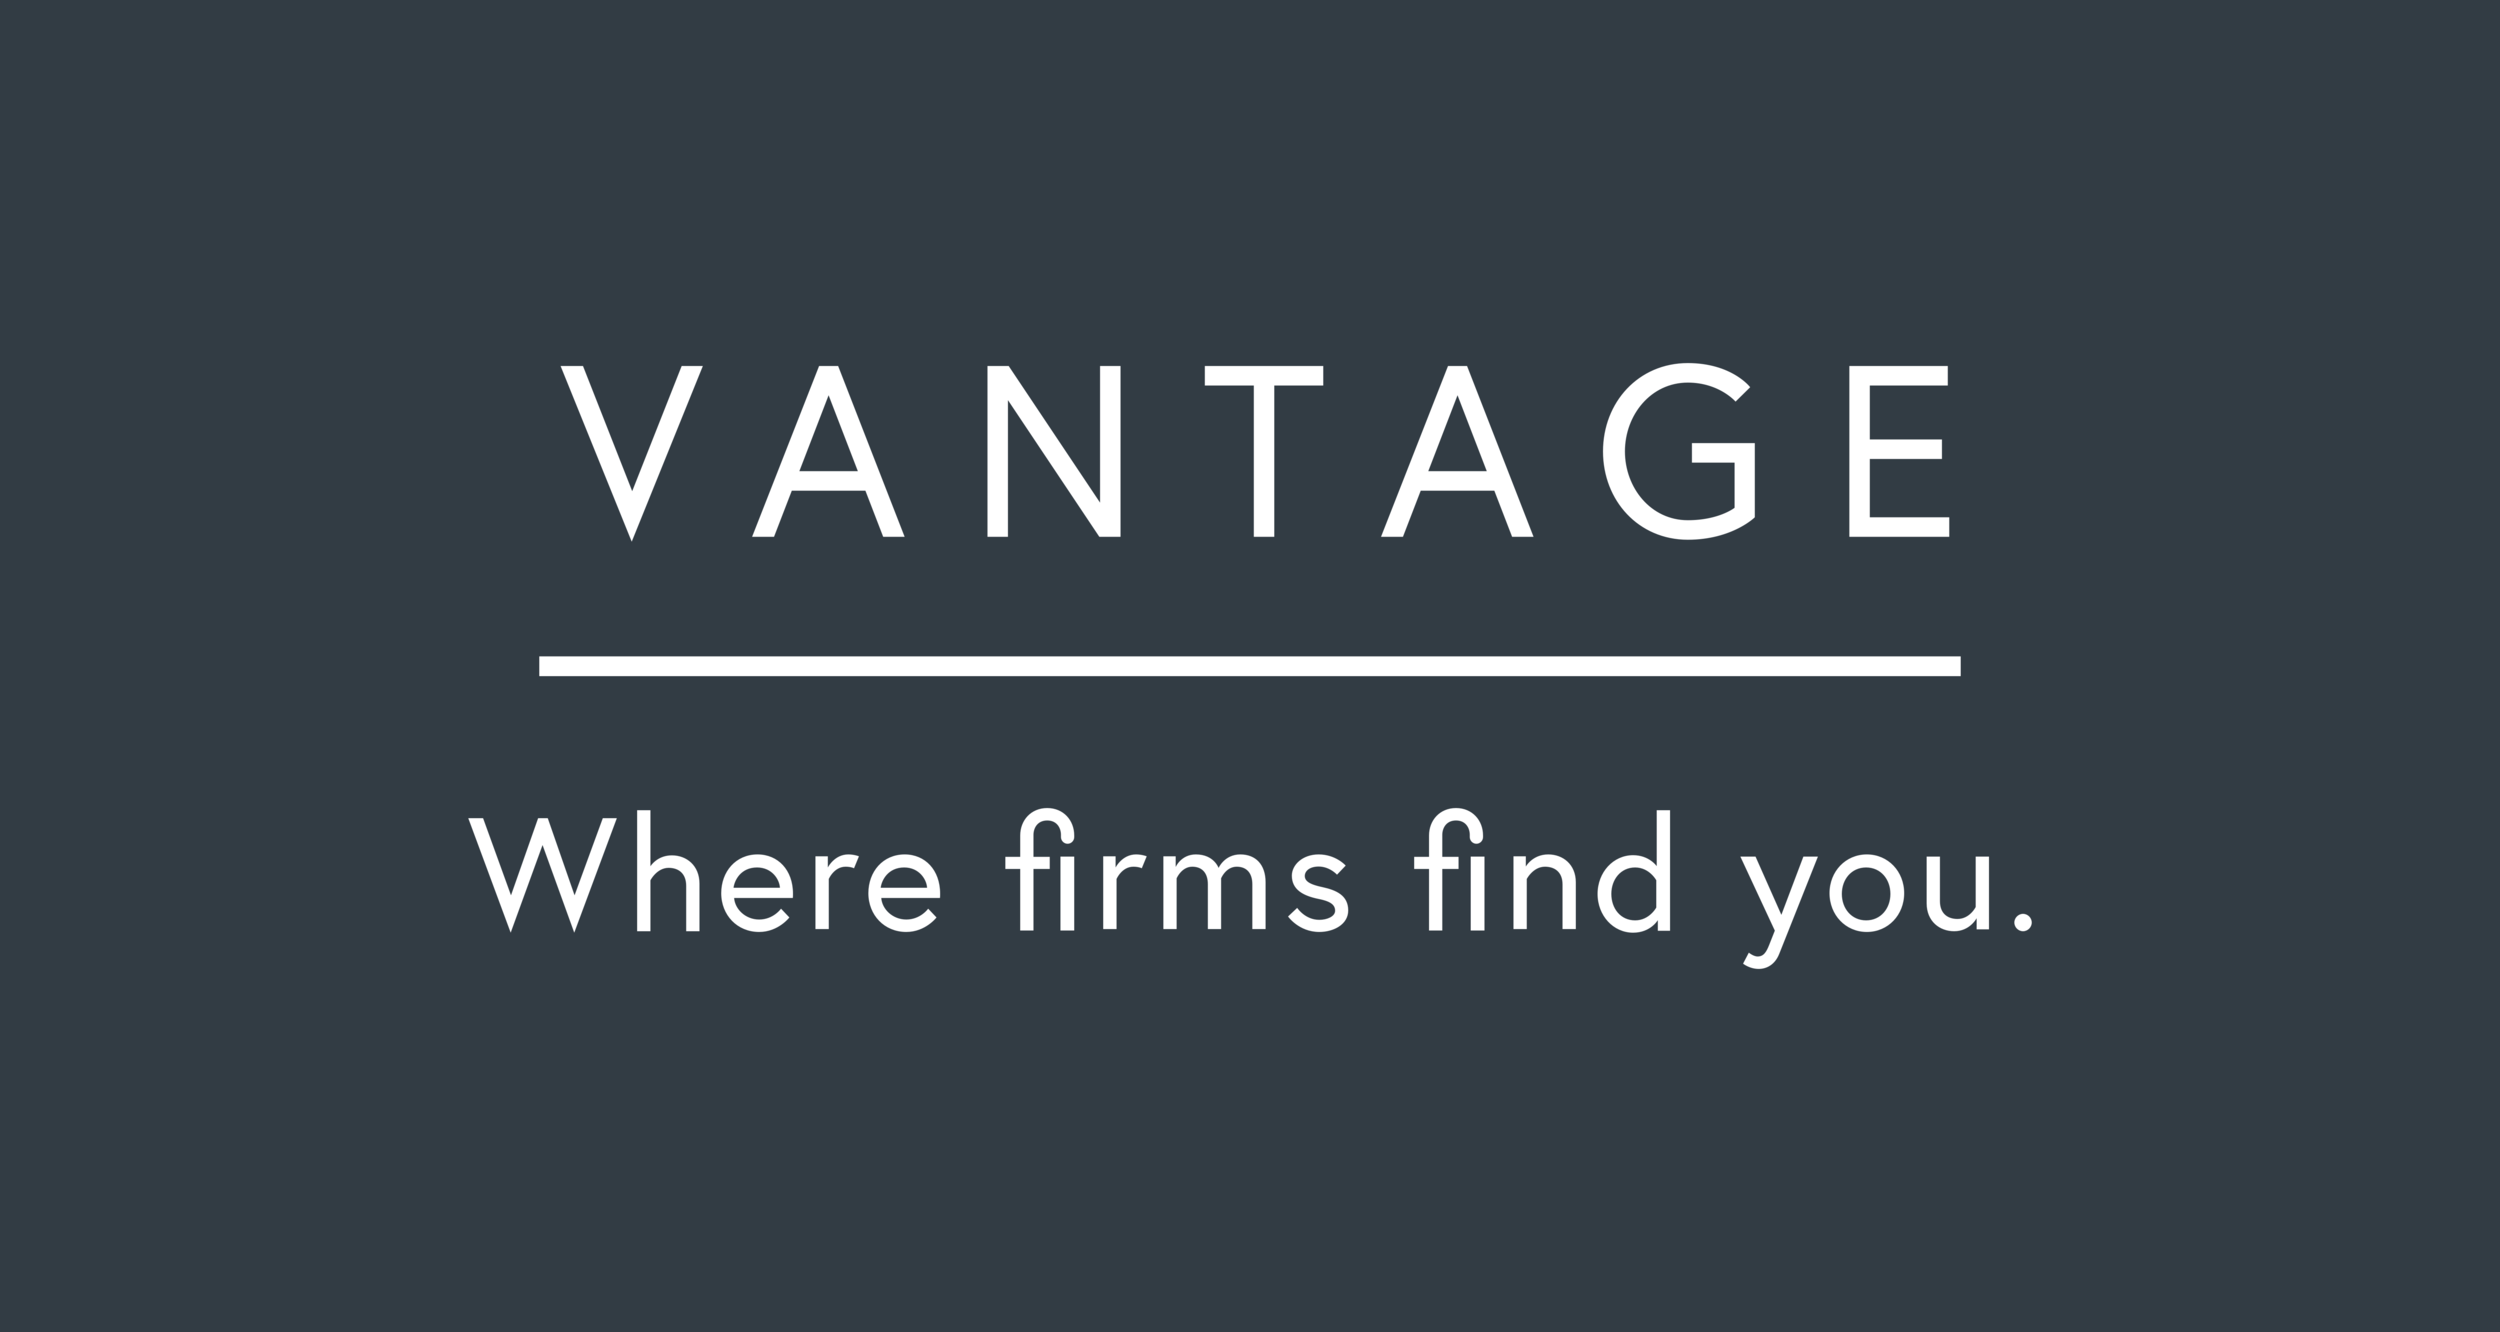 Vantage logo_tagline_dark.png